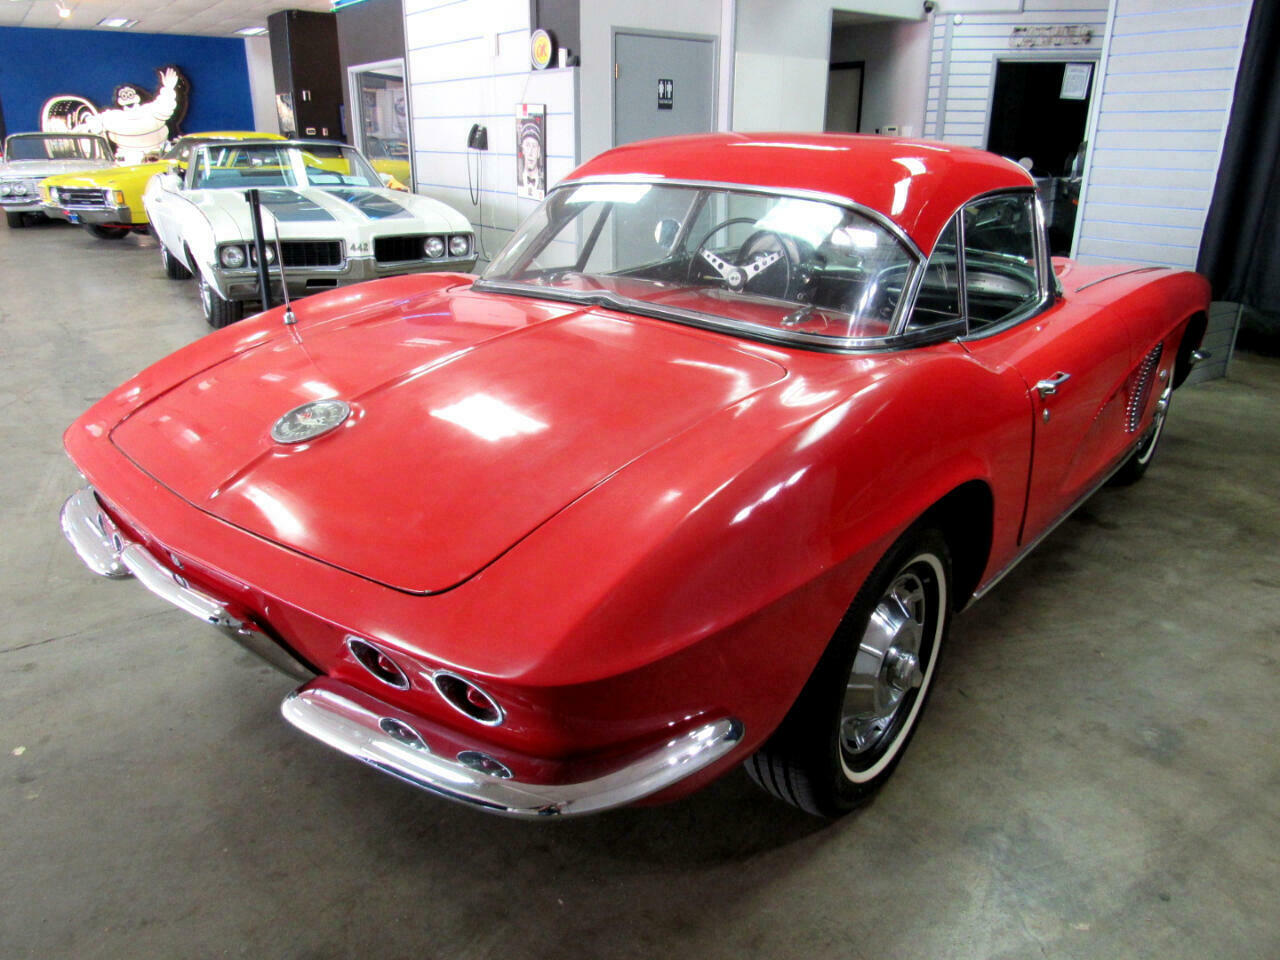 1962 Red Chevrolet Corvette Convertible    C1 Corvette Photo 5